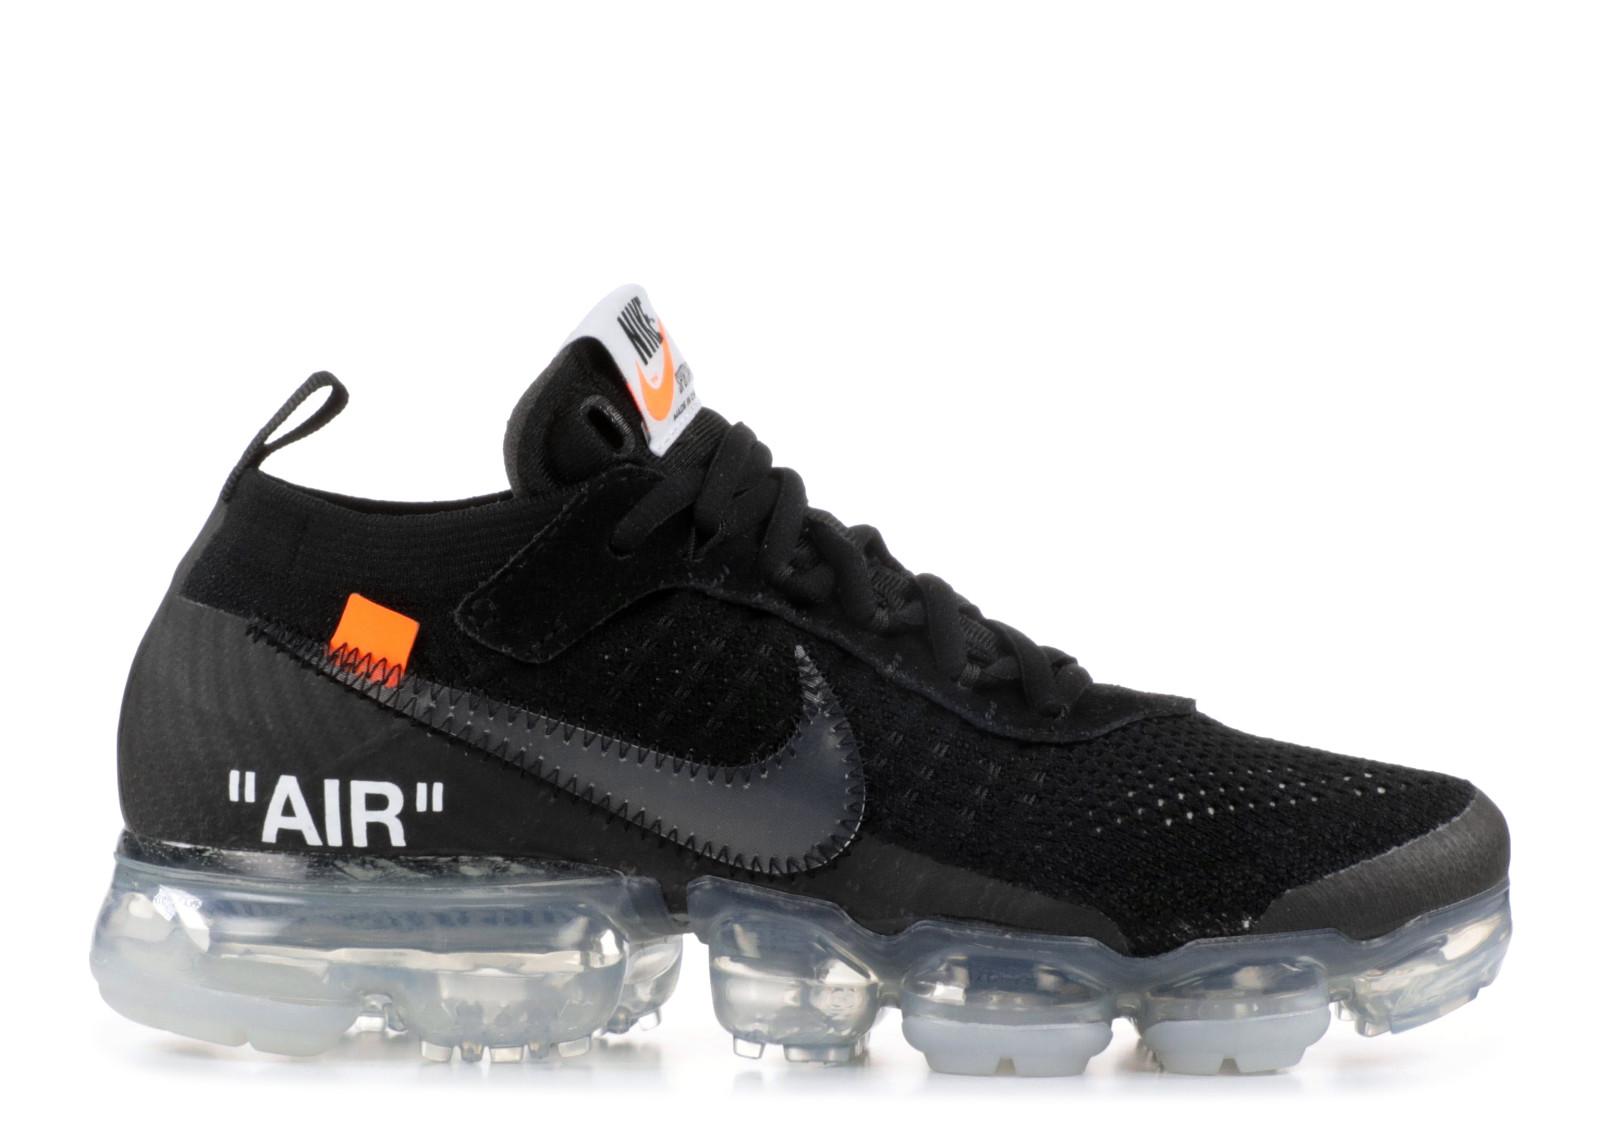 c7c5bcae15085 Nike Air Vapormax Off-White 2018 Black